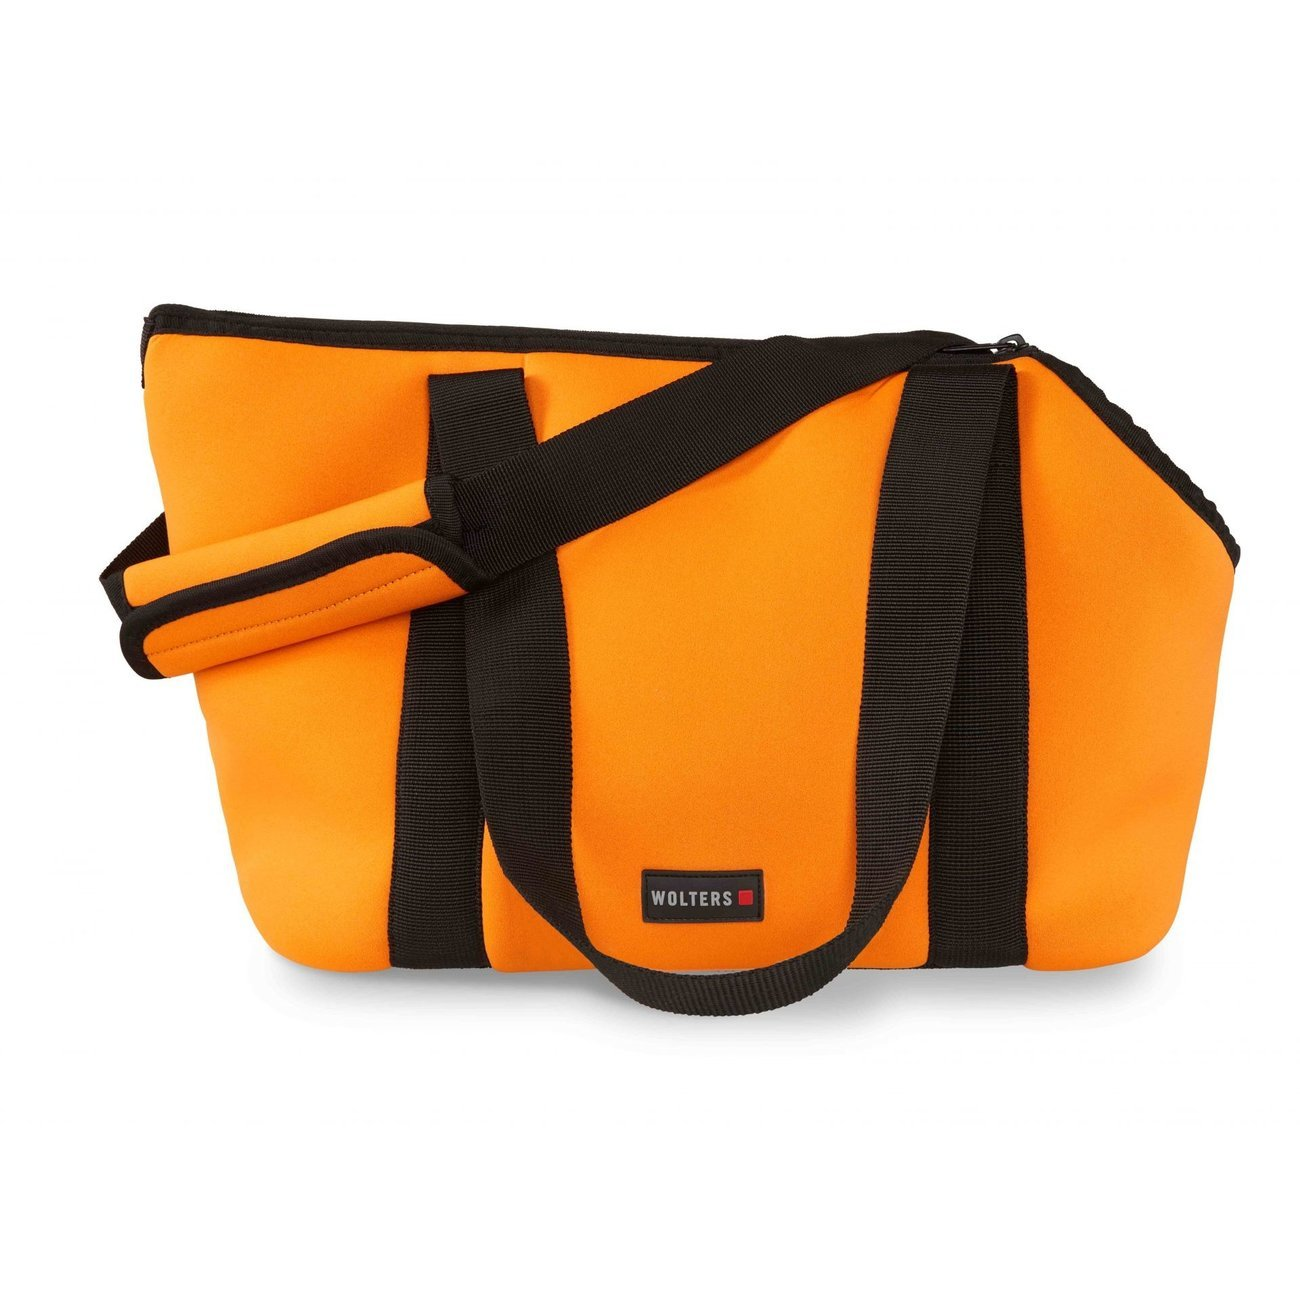 Wolters Softbag Neopren Softbag Hundetasche, S: 35x20x25cm mango